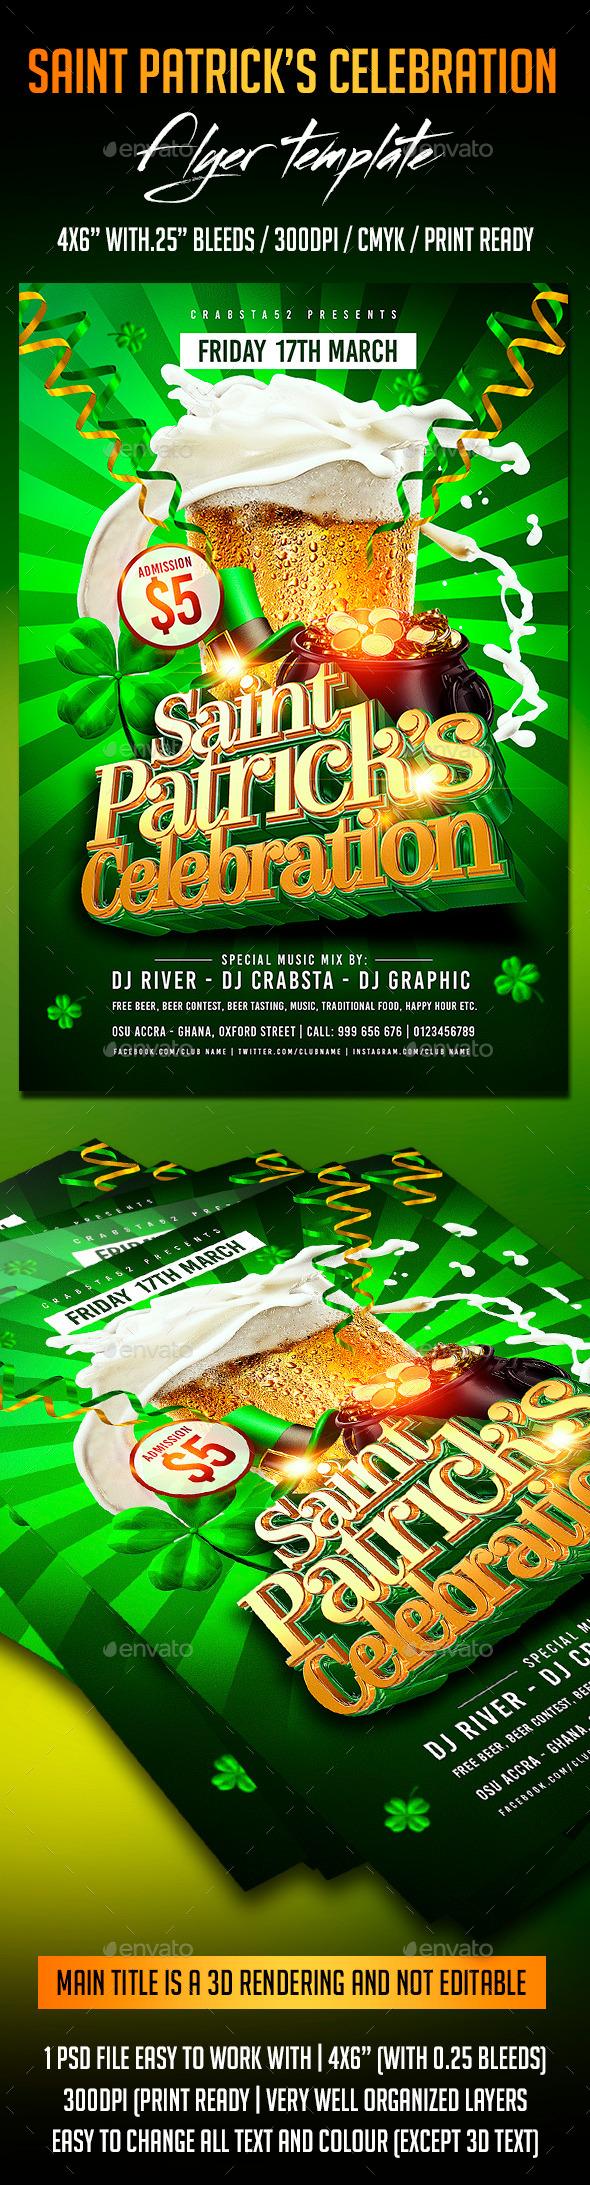 Saint Patrick's Celebration Flyer Template - Events Flyers